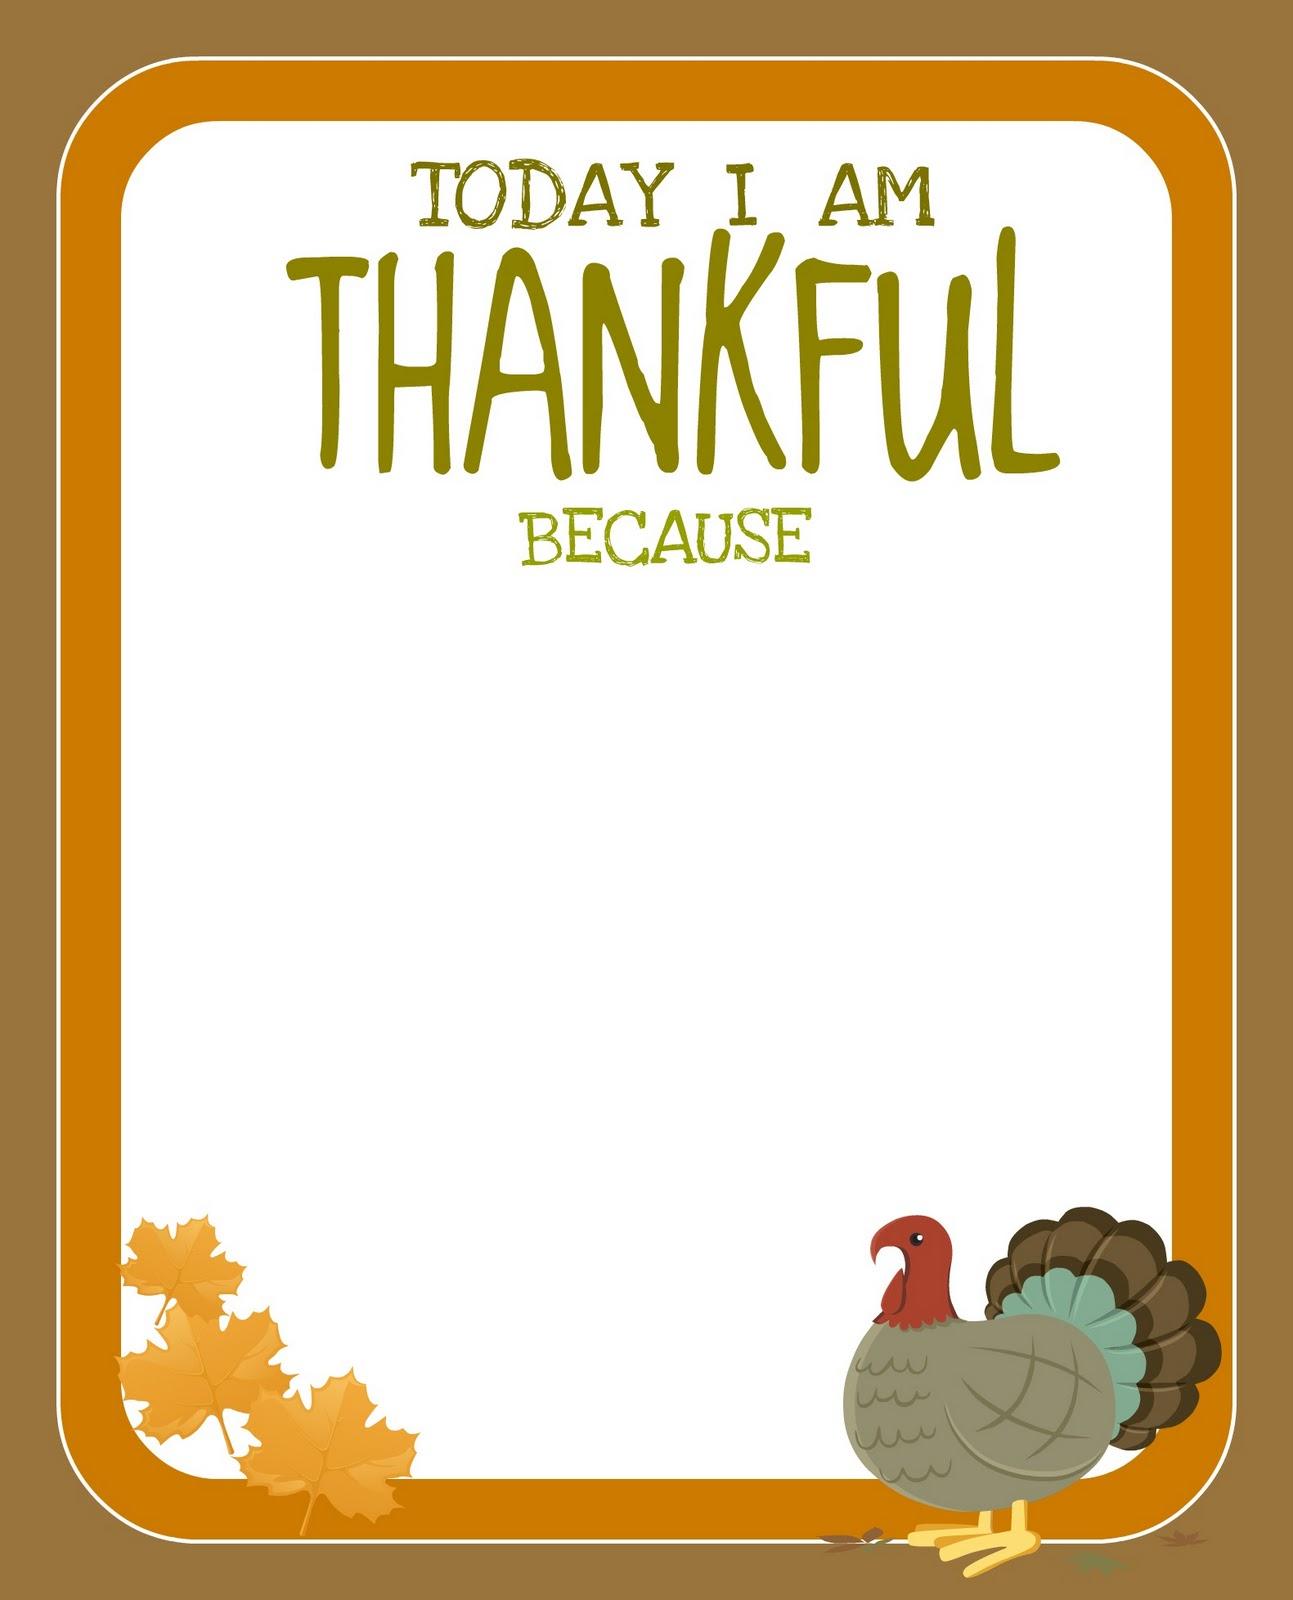 Printable} Free Thanksgiving Printable! - Creative Juice - Free Printable For Thanksgiving